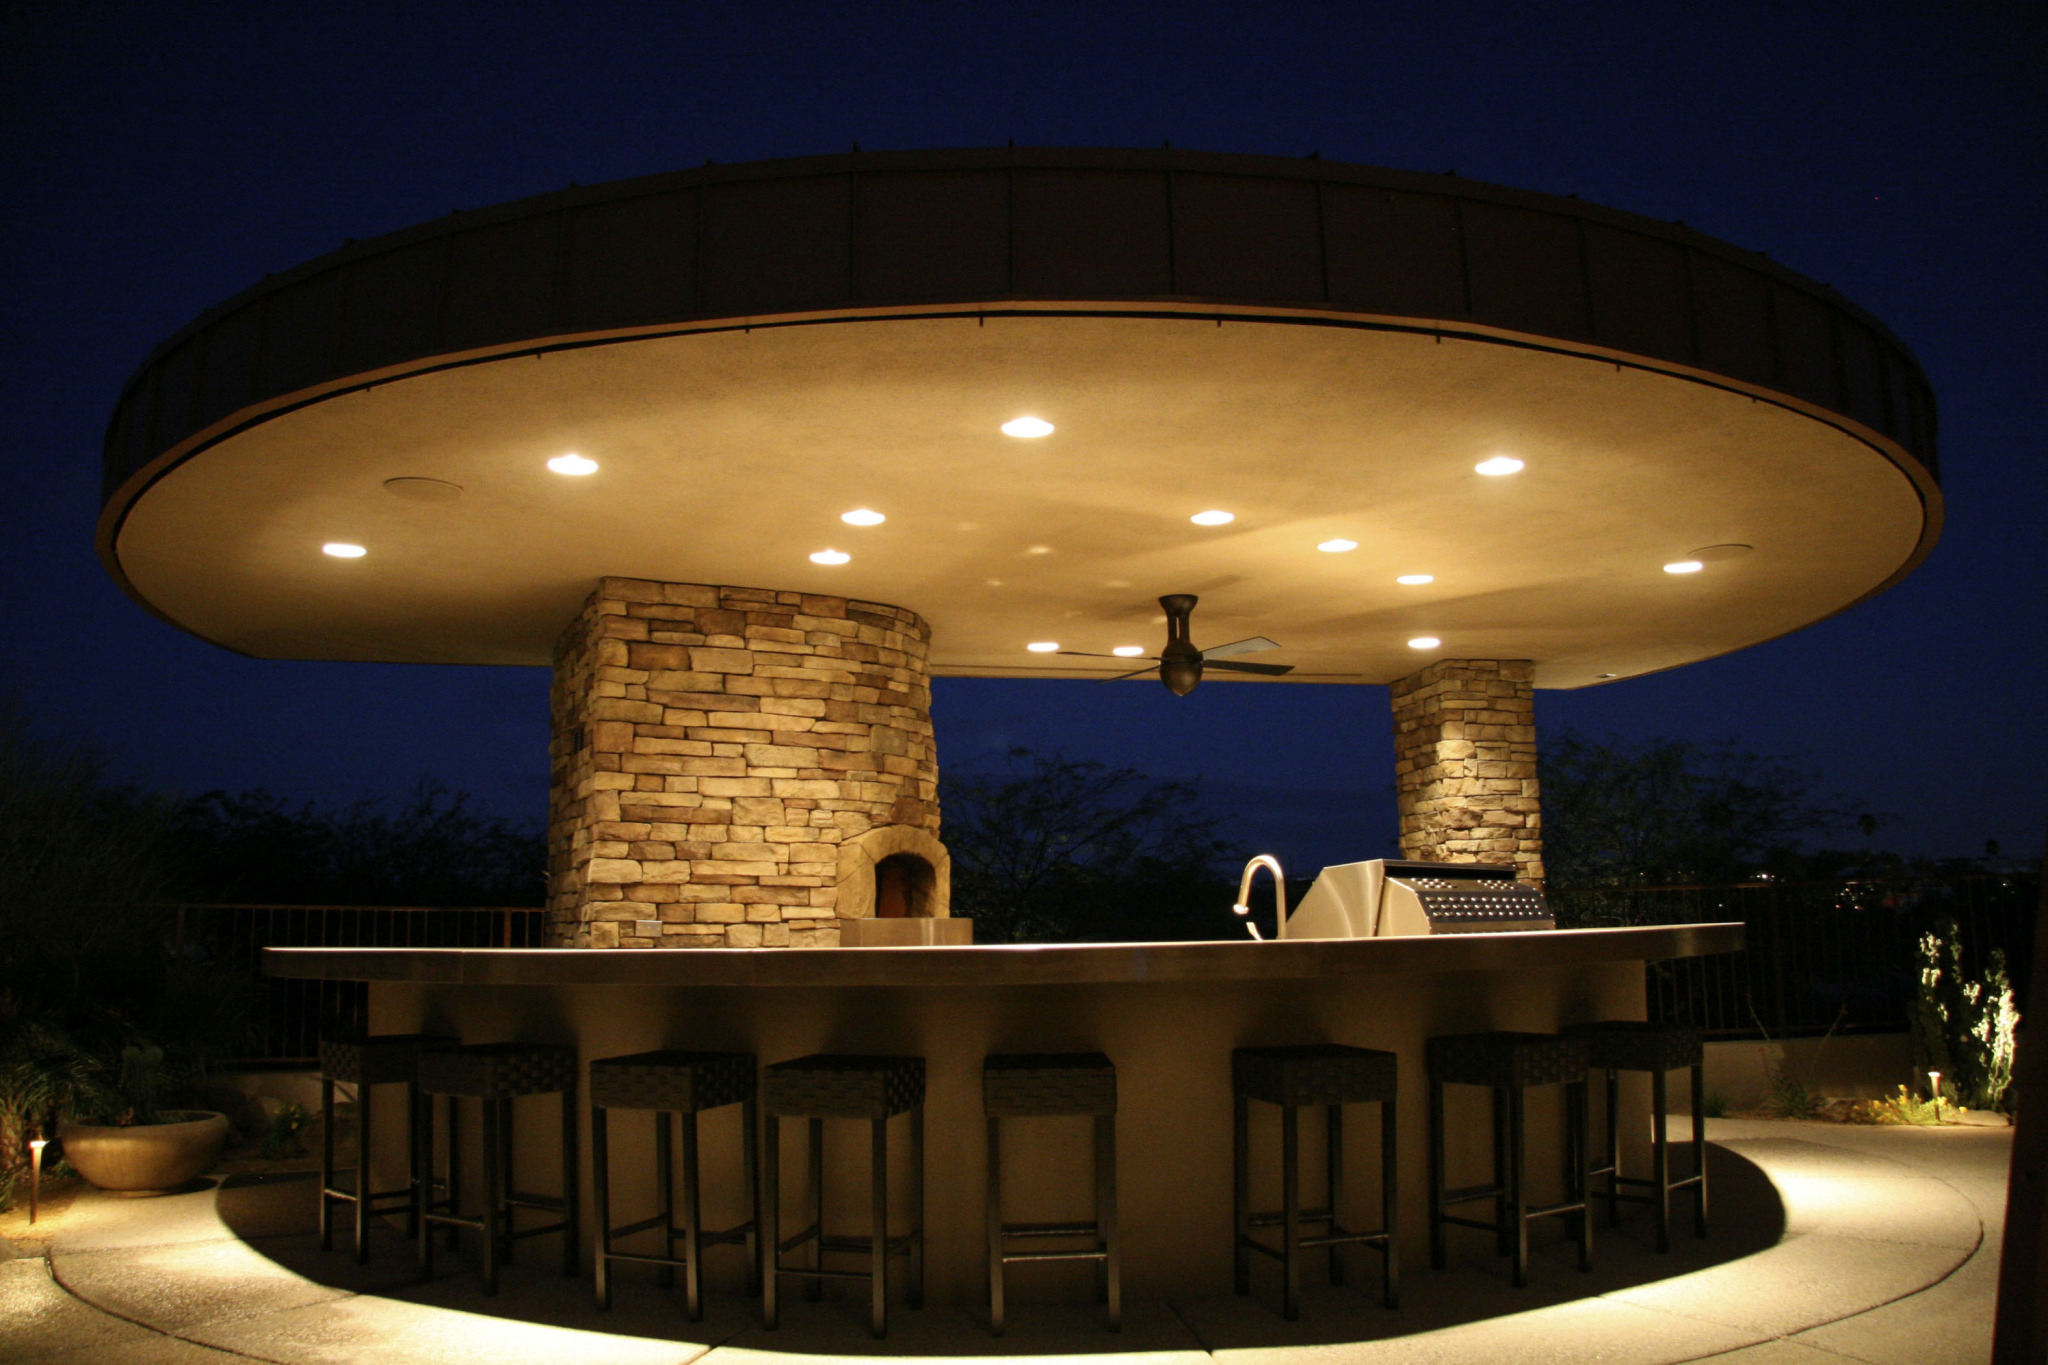 Mugnaini Medio oven in an outdoor setting at night